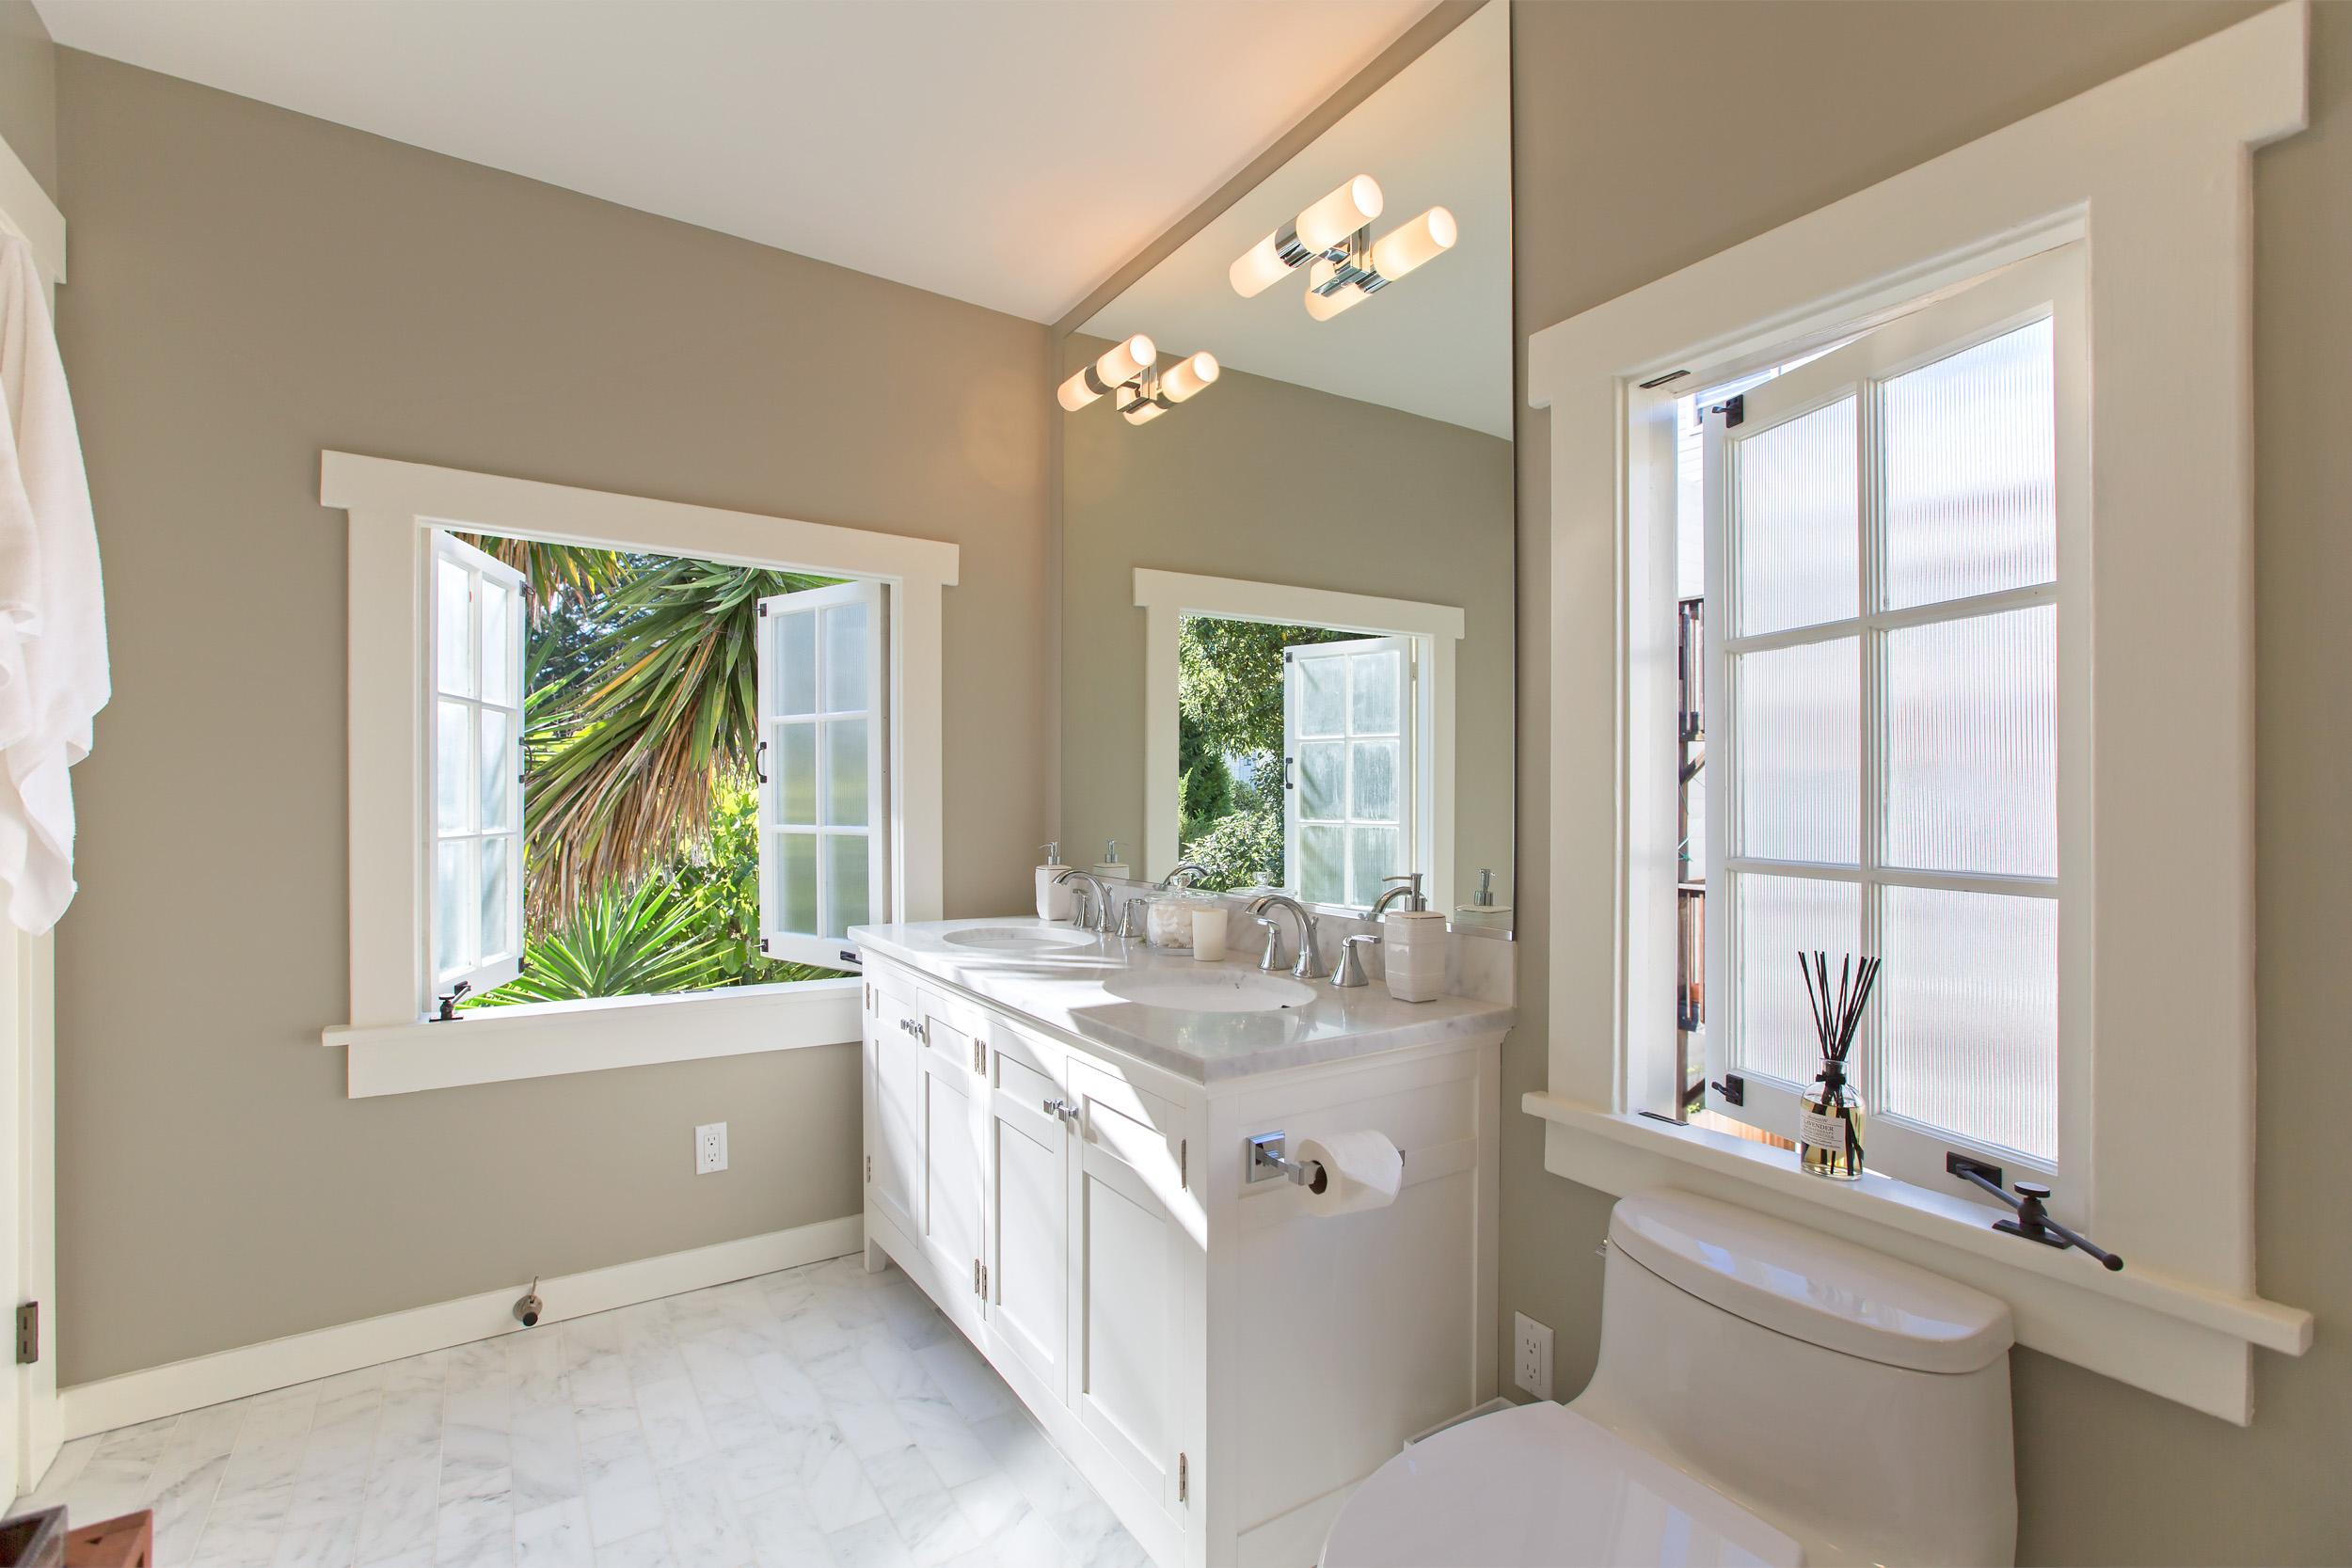 william-adams-design-cole-valley-white-bathroom-double-marble-vanity-wide-angle.jpg